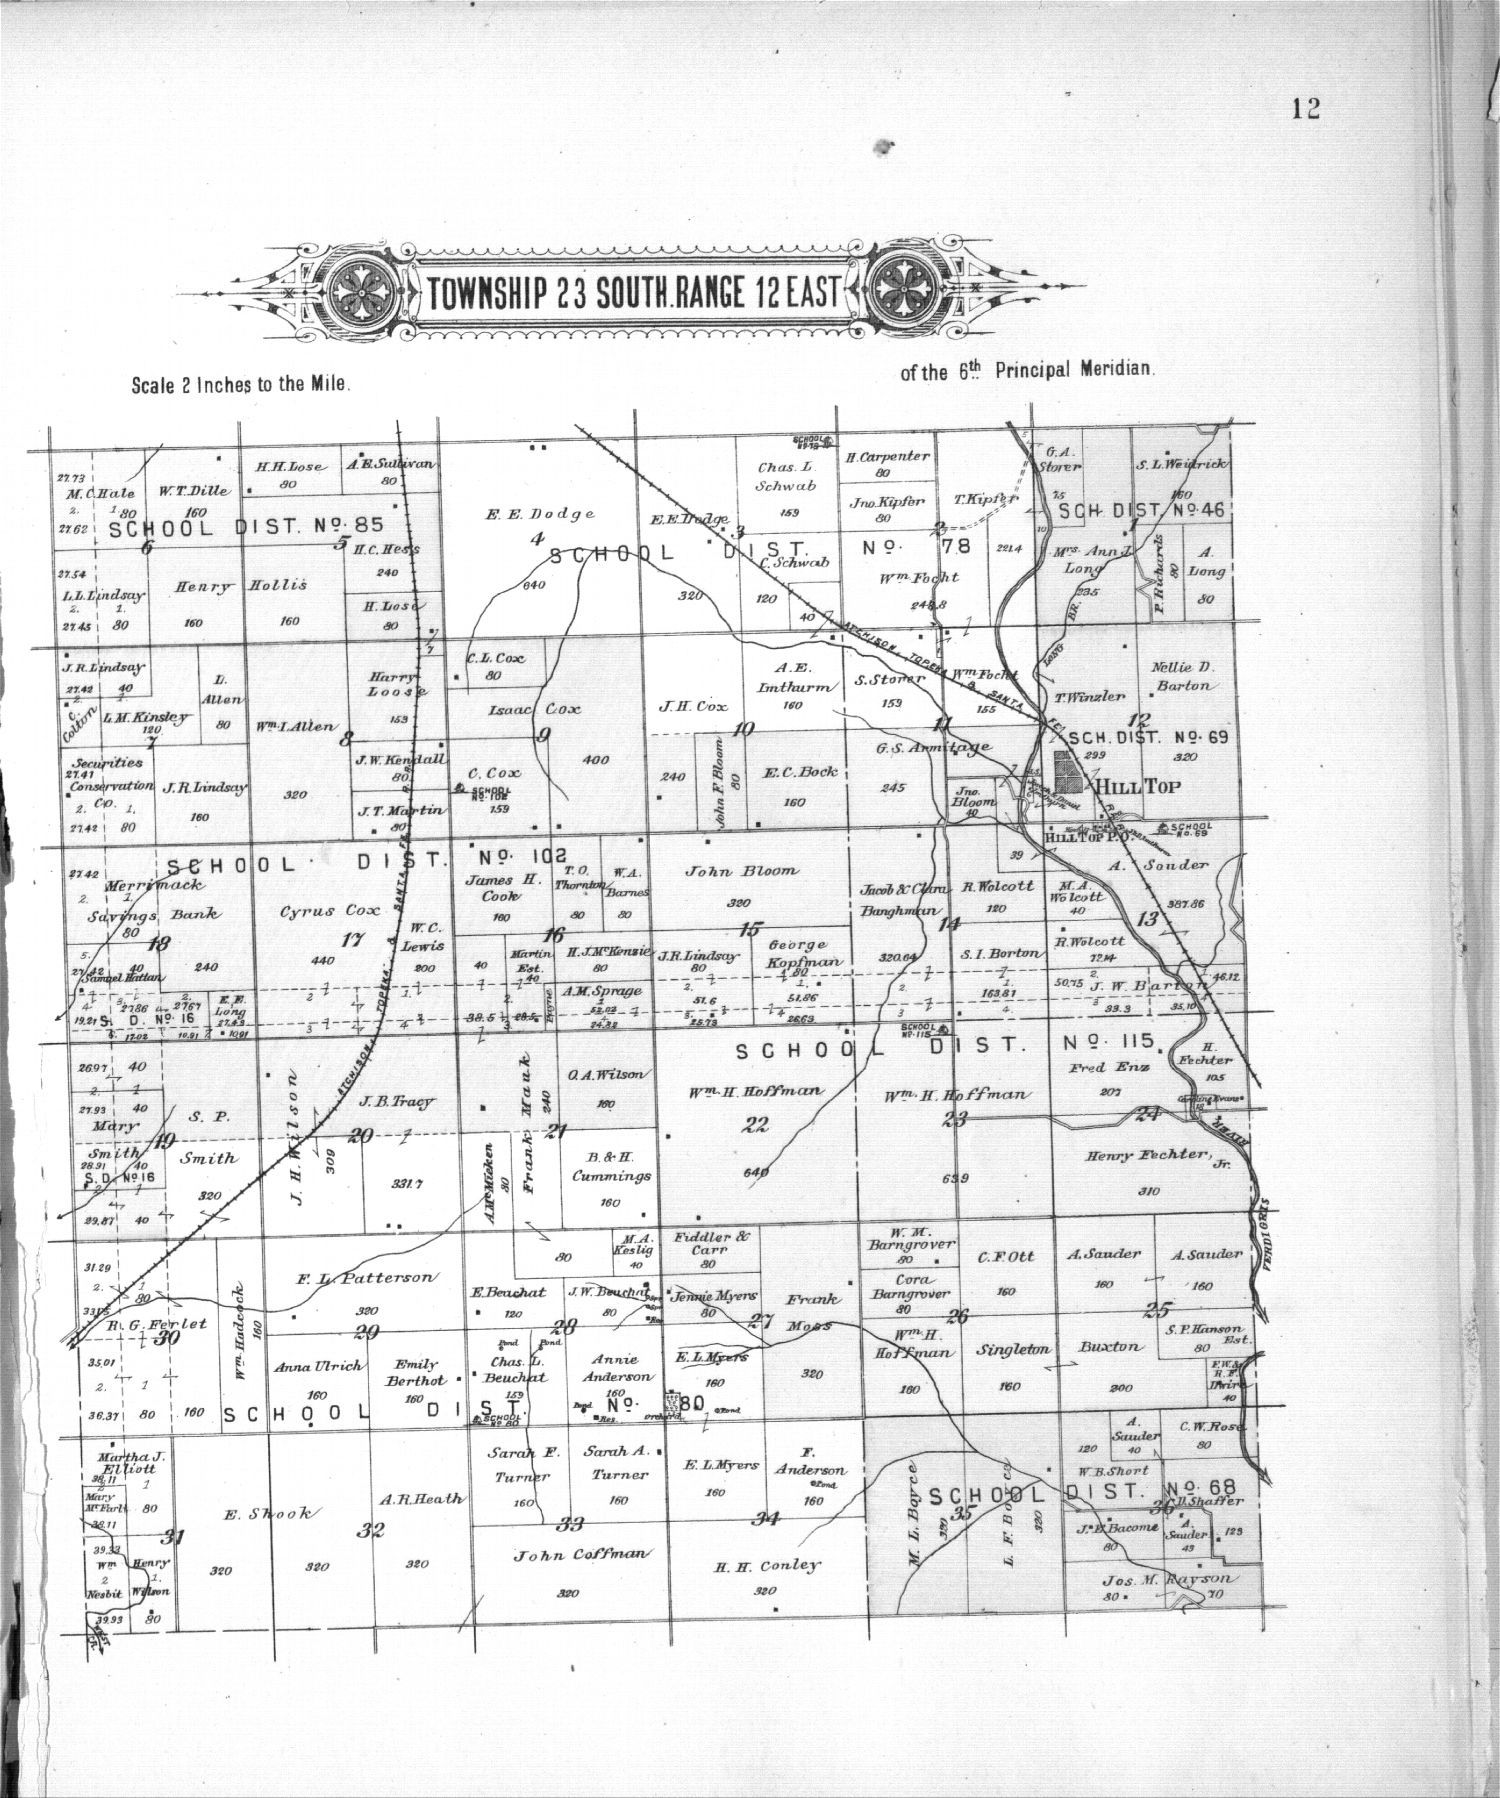 Plat book of Greenwood County, Kansas - 12